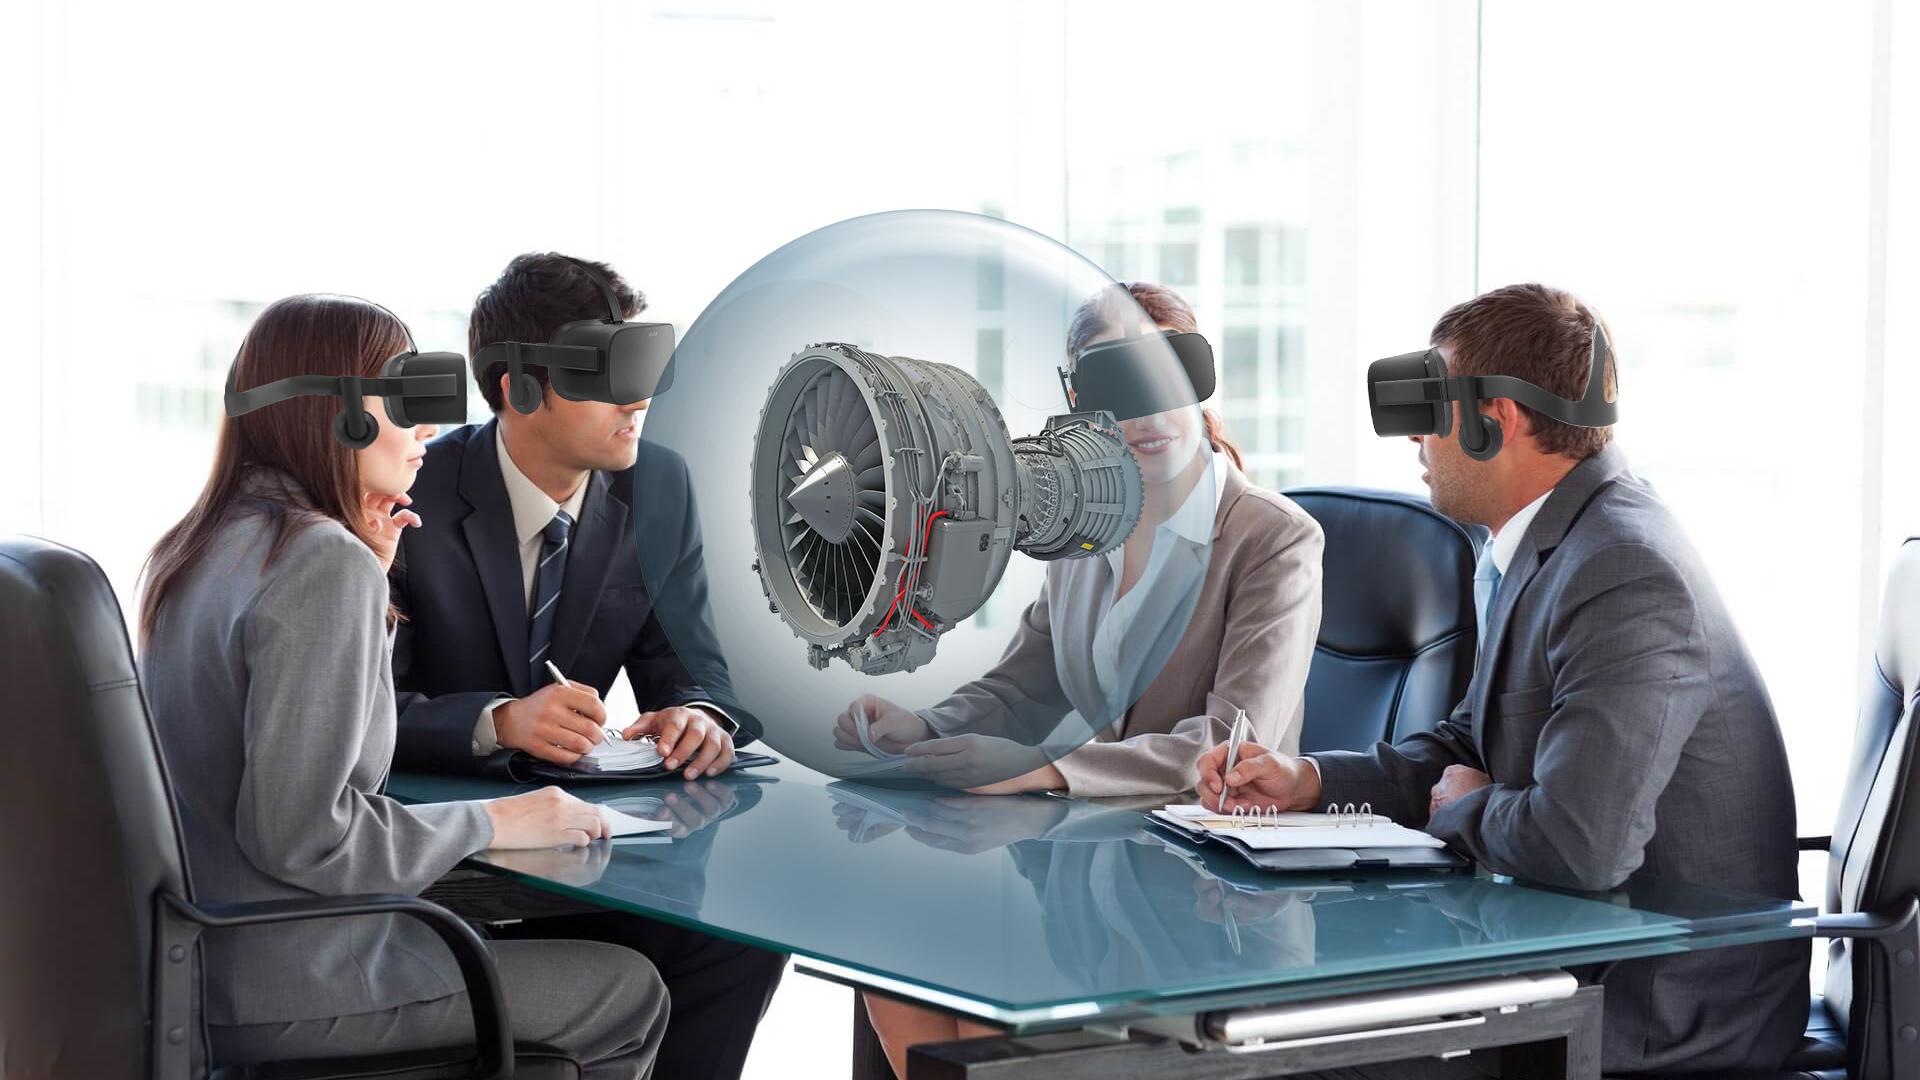 VR live demo